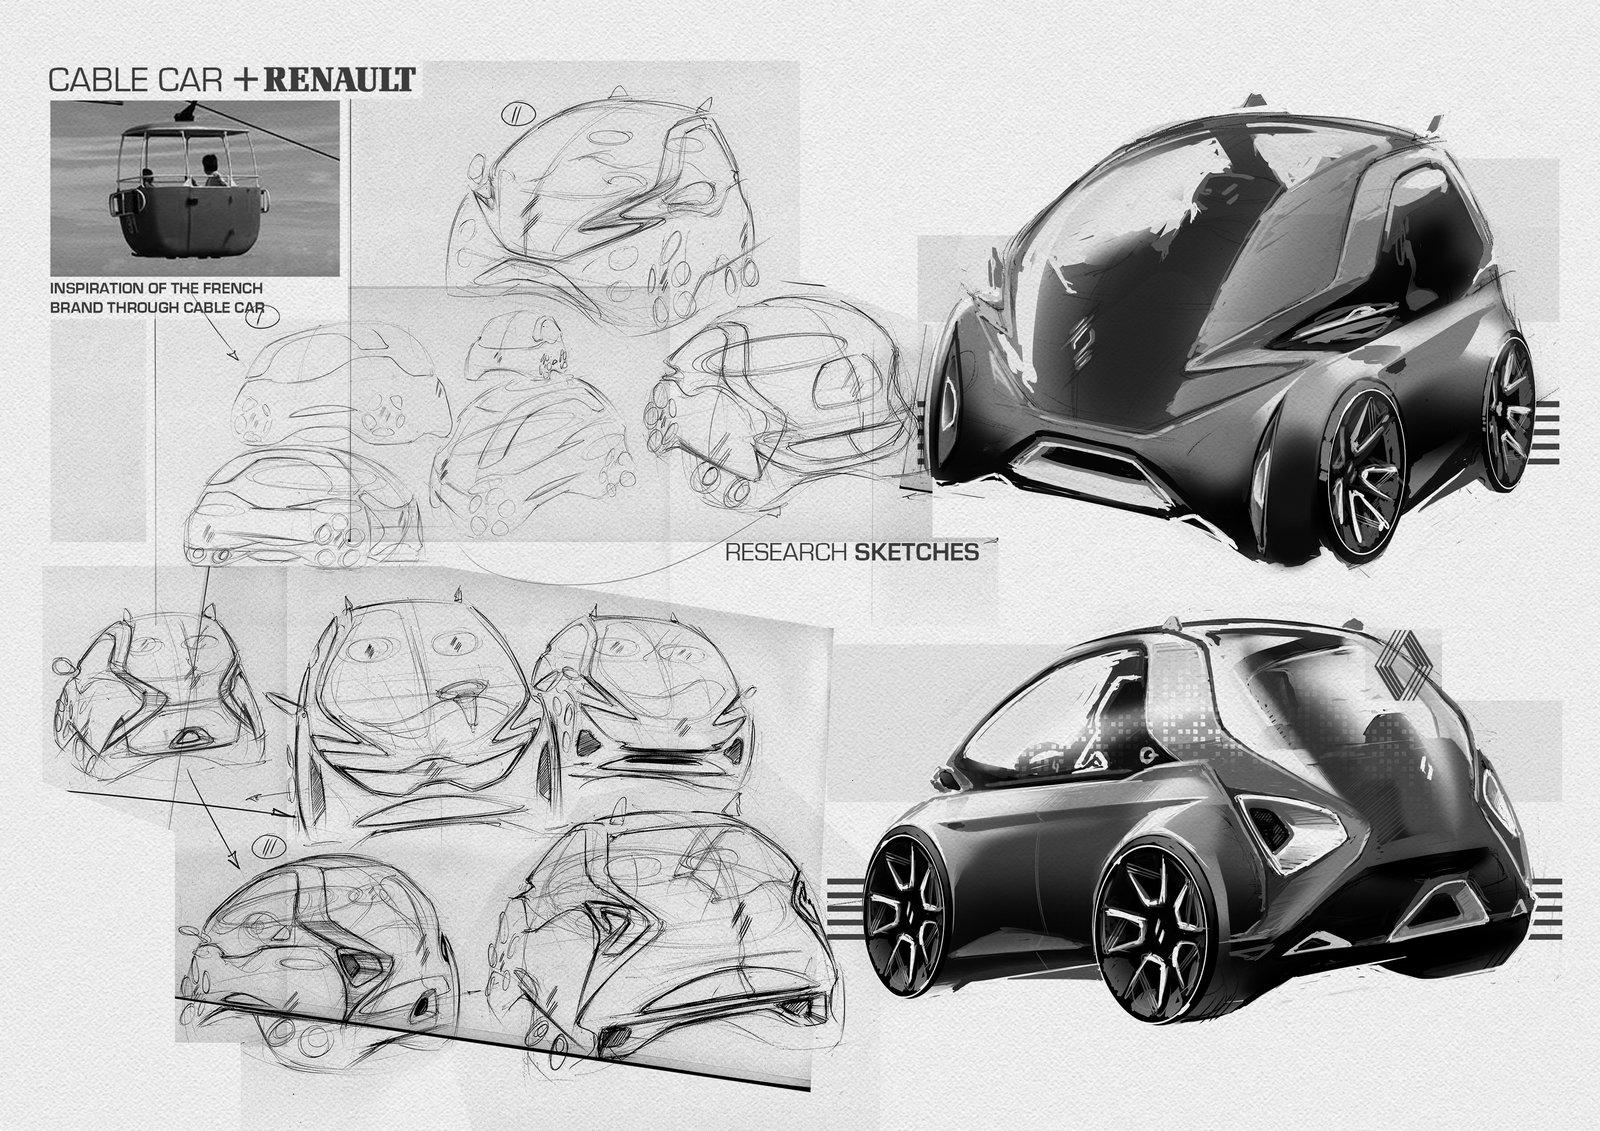 ArtStation - Cable Car + Renault, Andrej Vasiutin